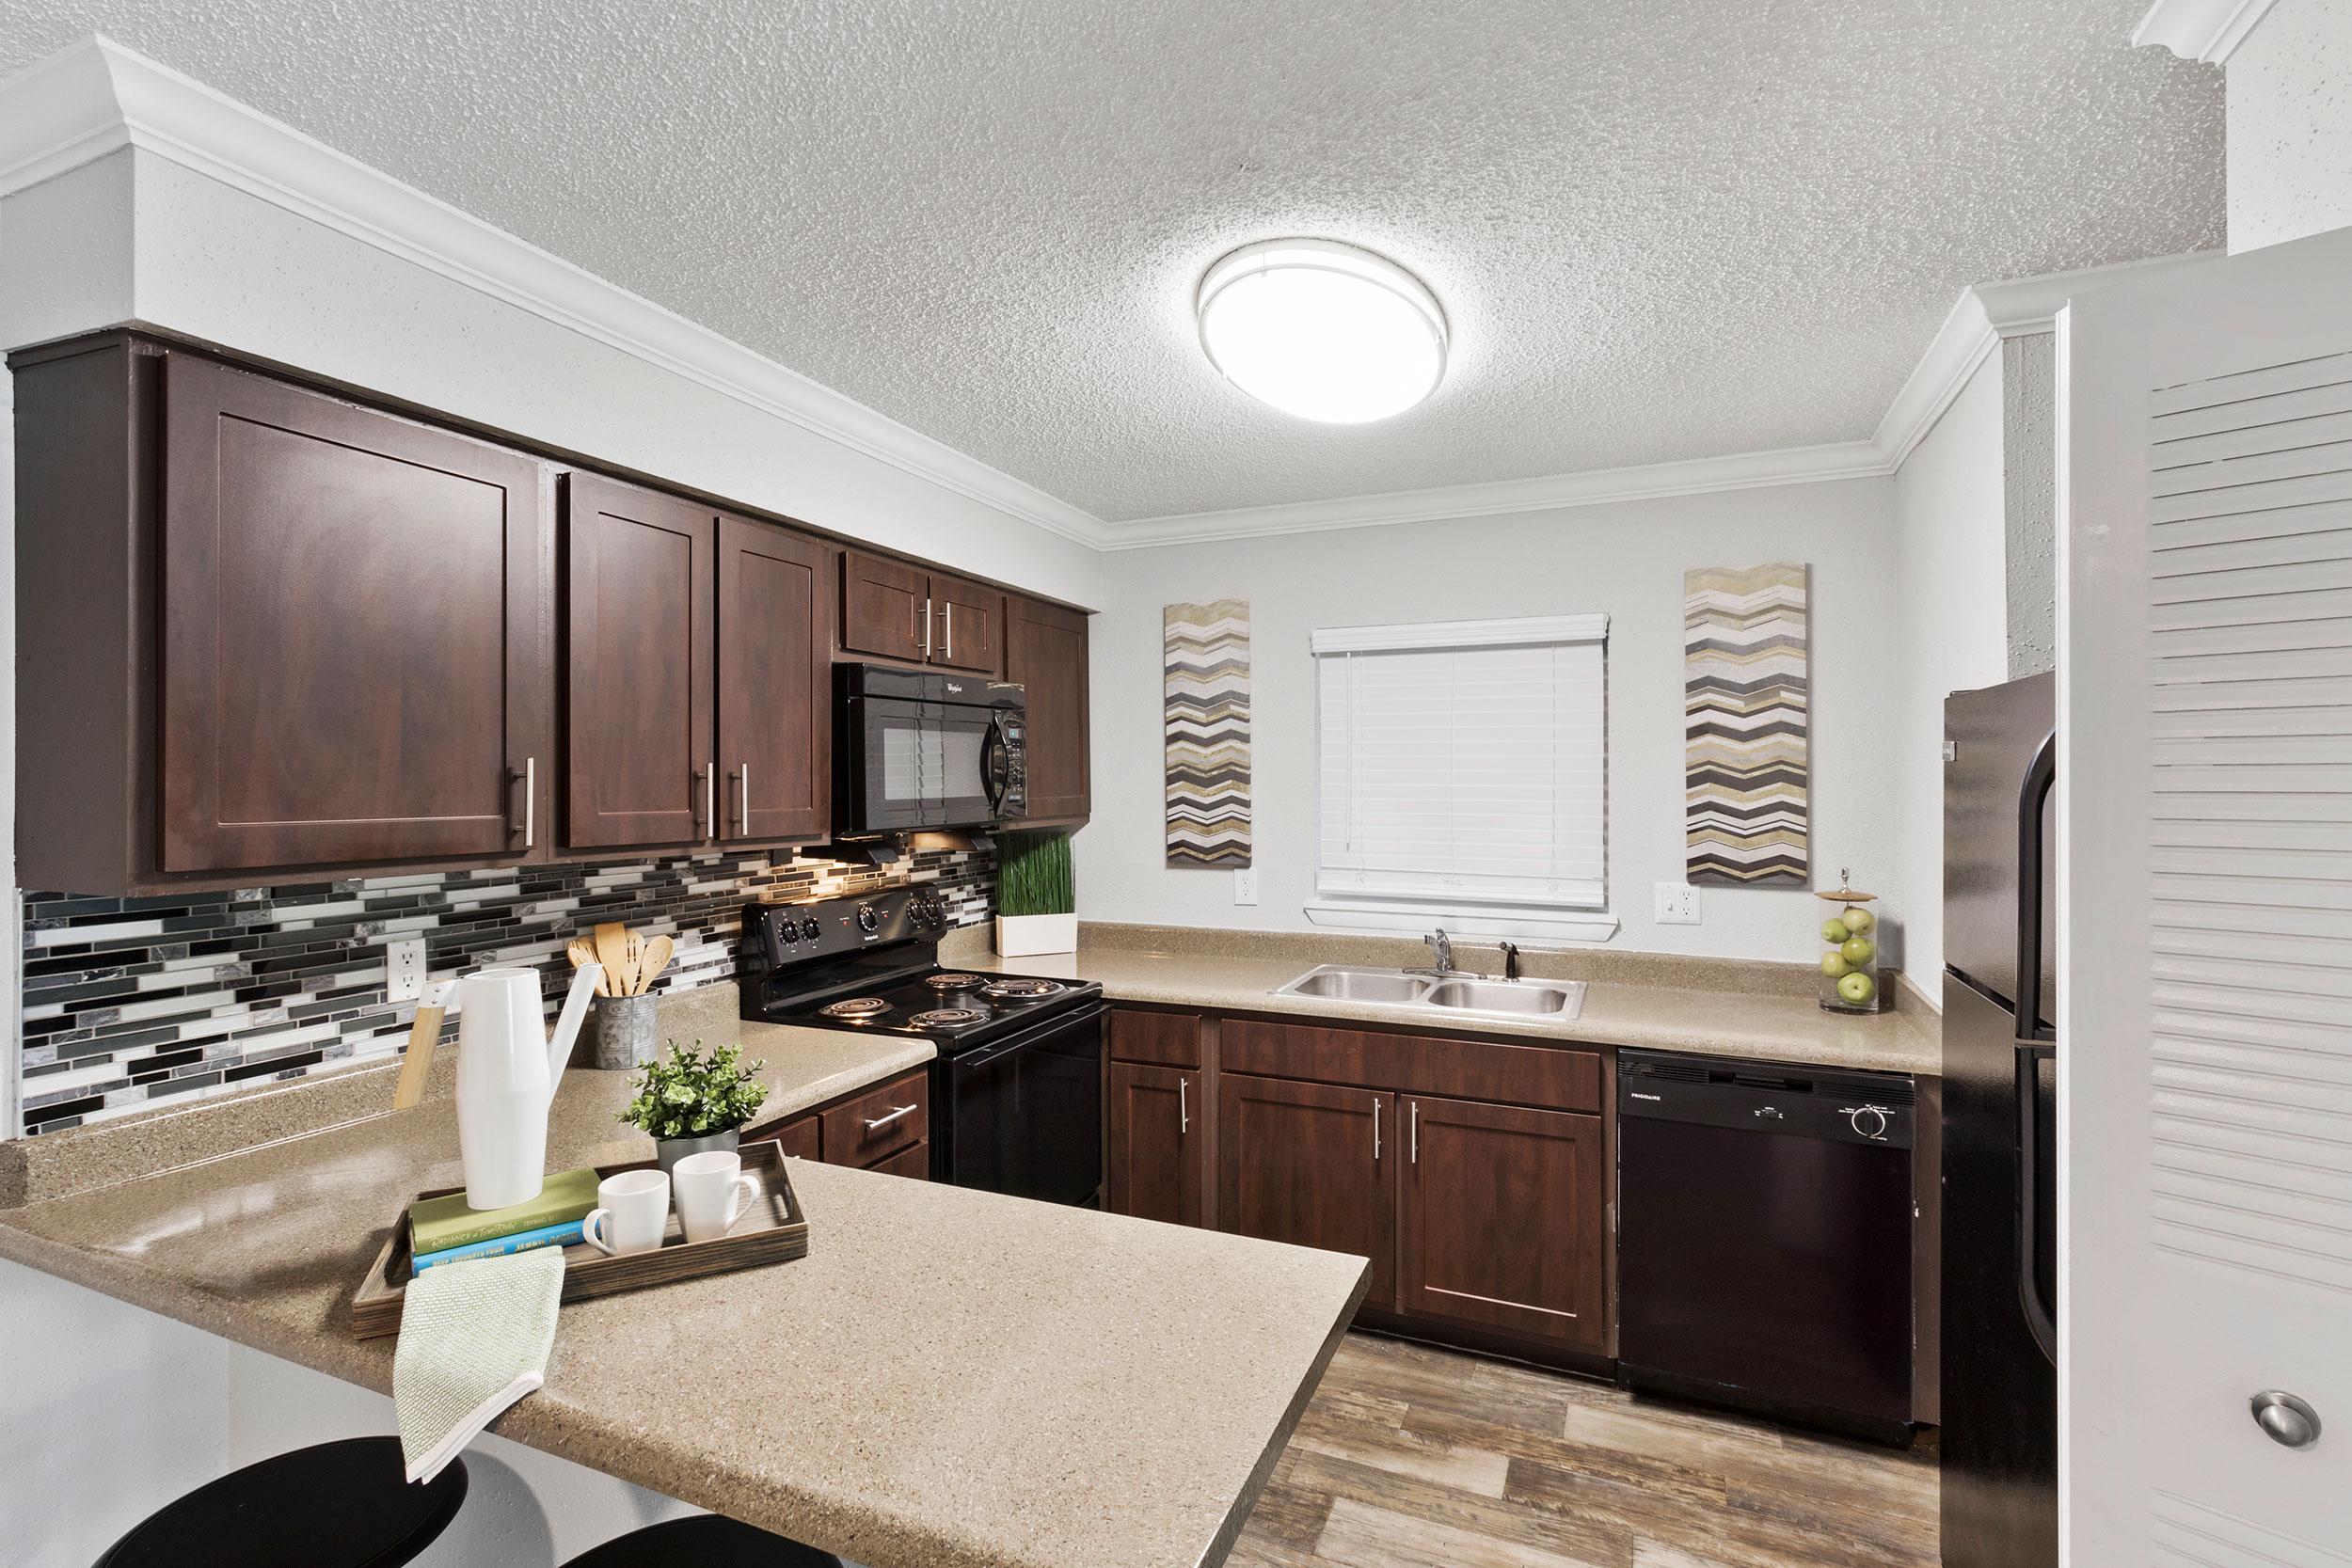 Ab-kitchen-20new